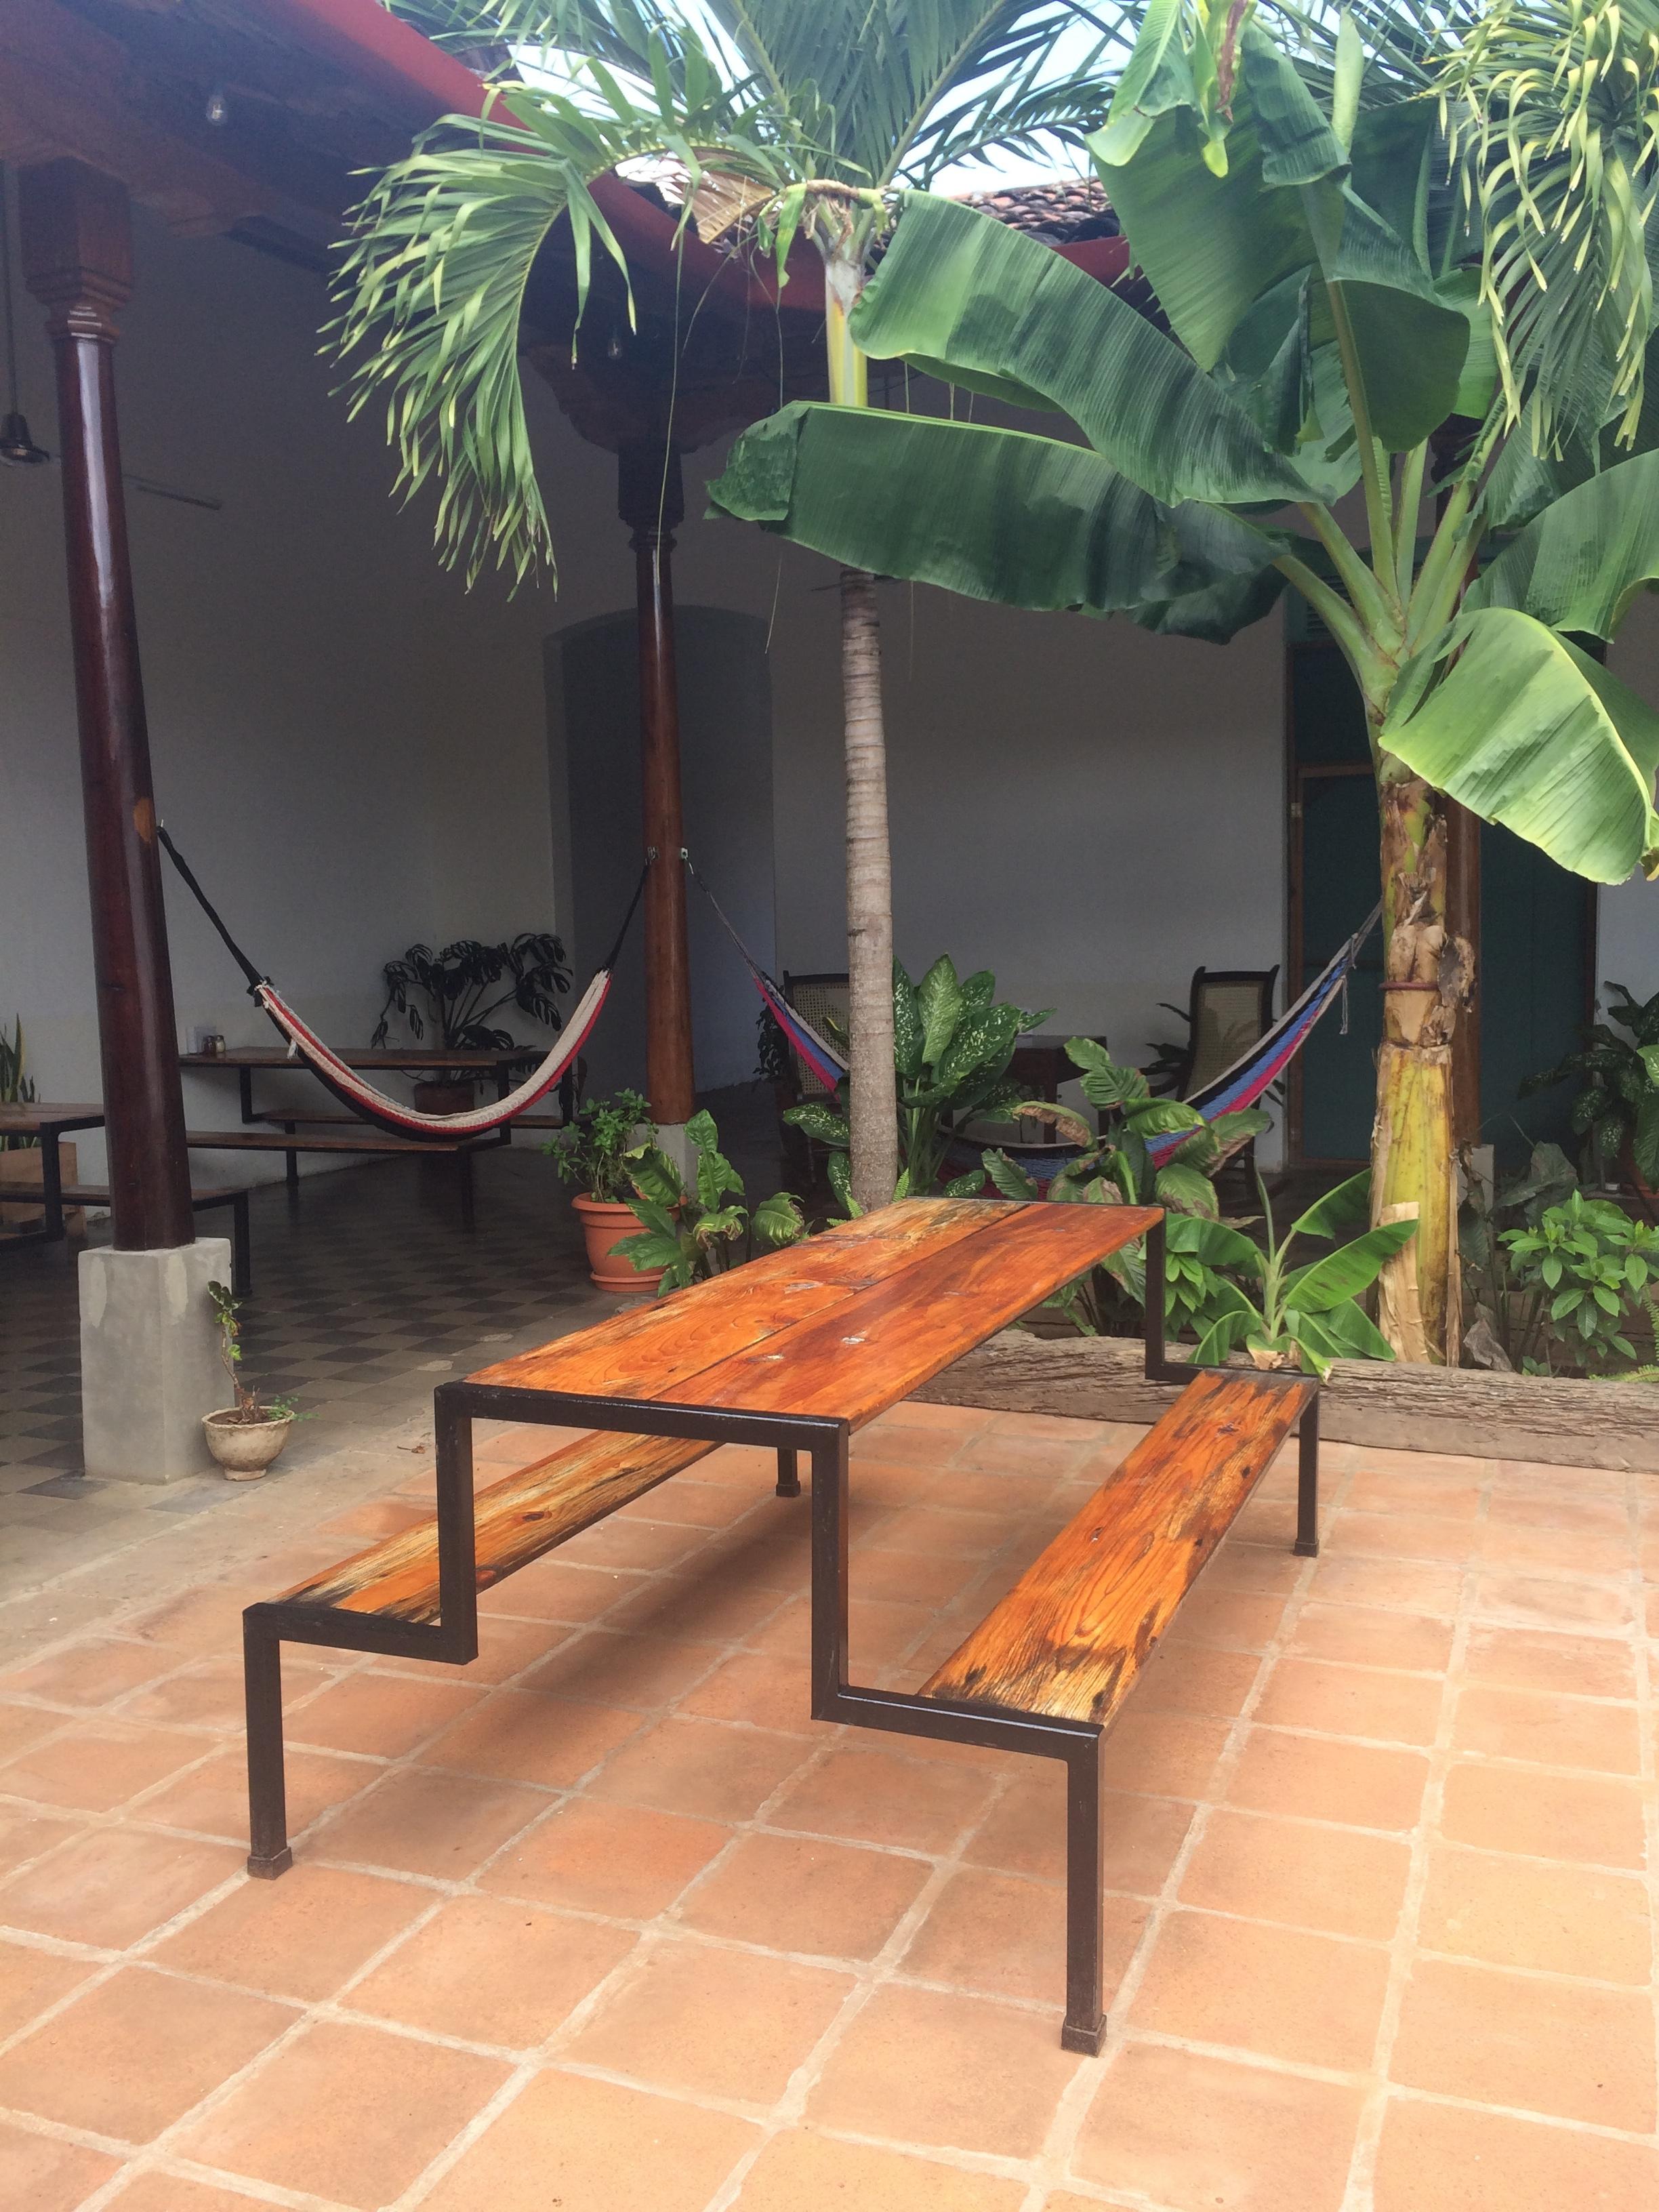 Pan de Vida Granada, Nicaragua